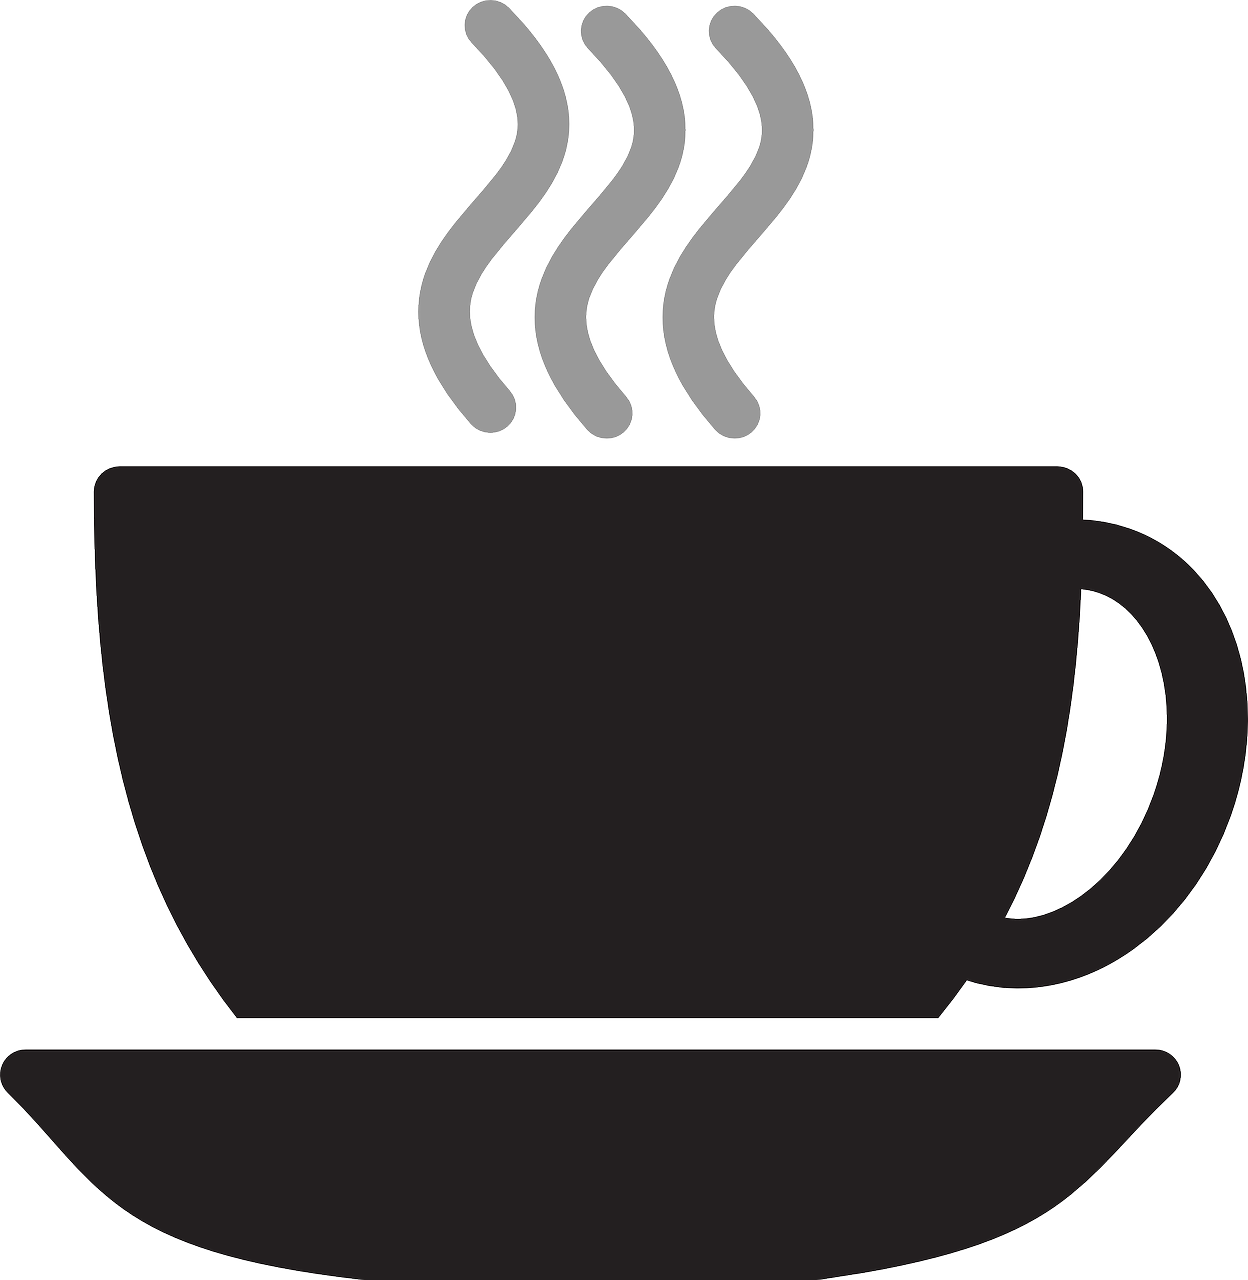 royalty free stock steam drawing coffee mug #103775286